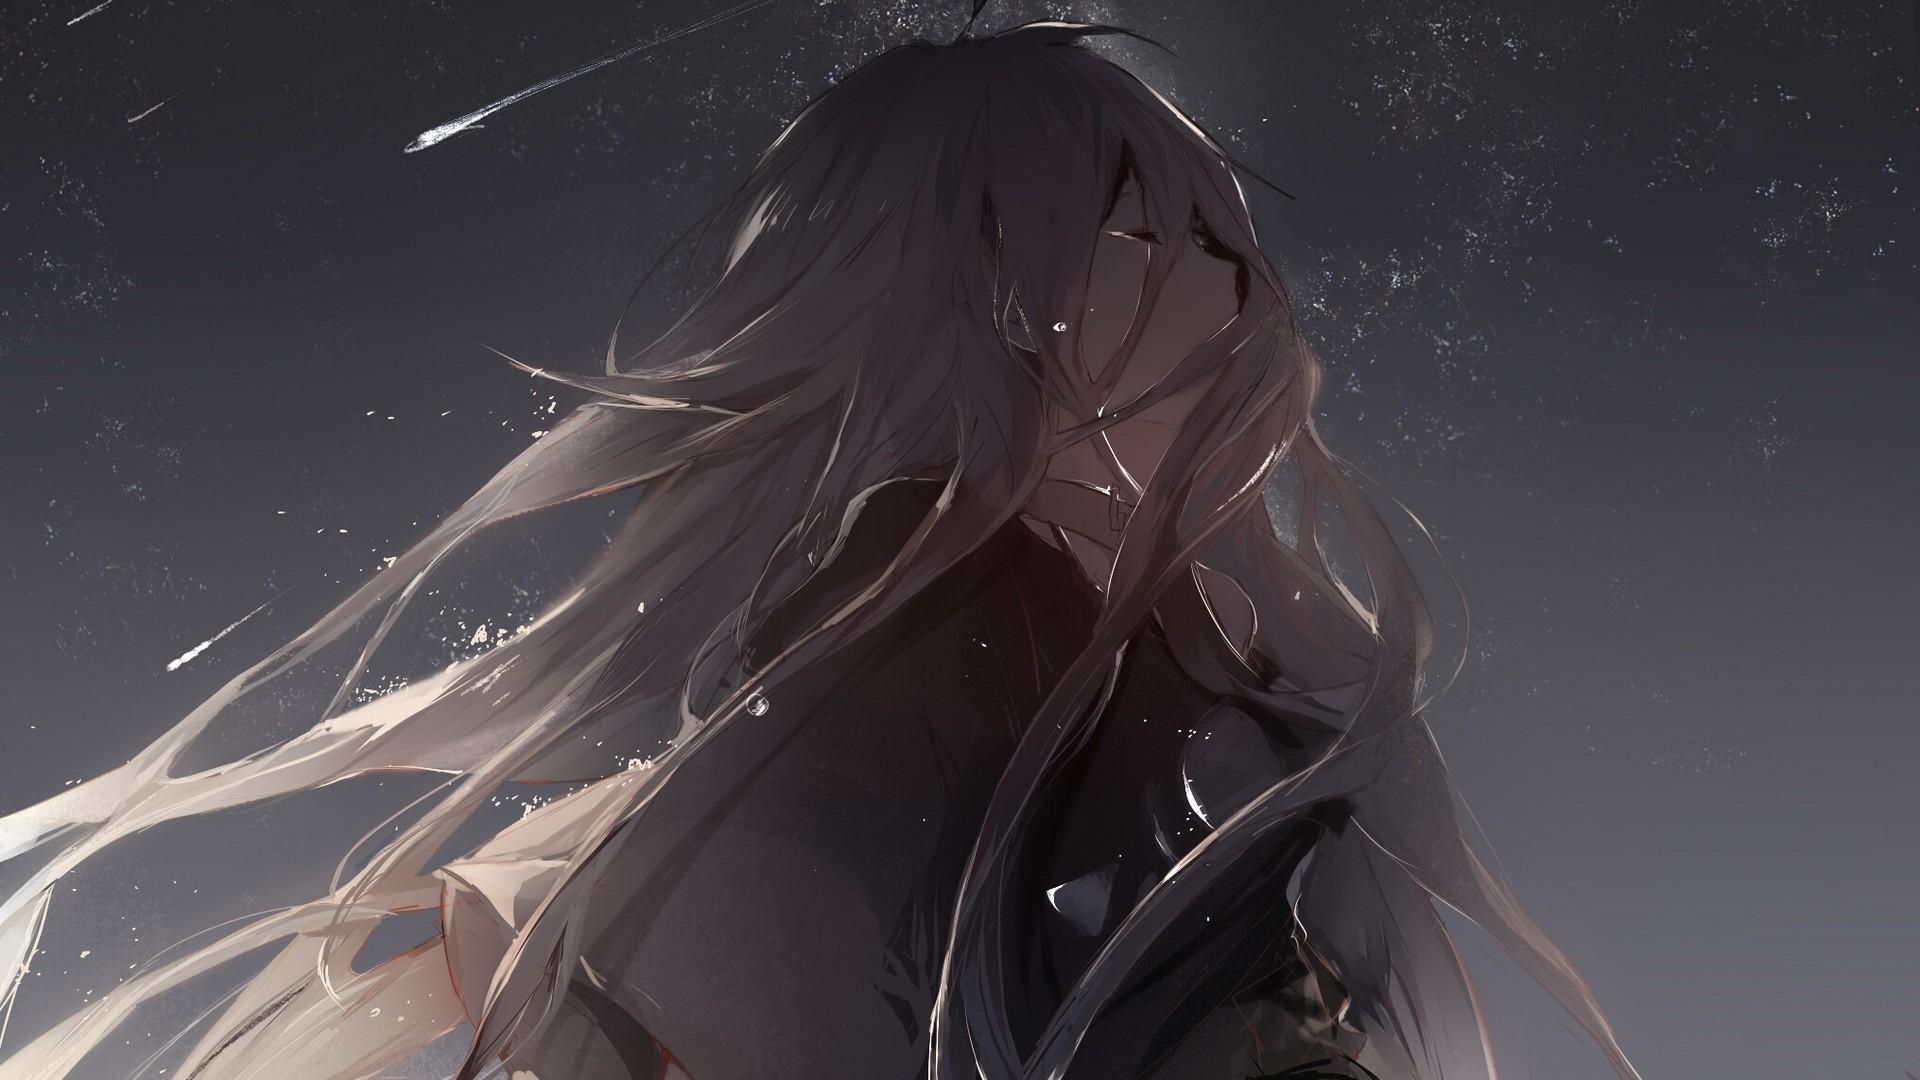 Sad anime wallpaper 64 images - Anime wallpaper 1360x768 hd ...